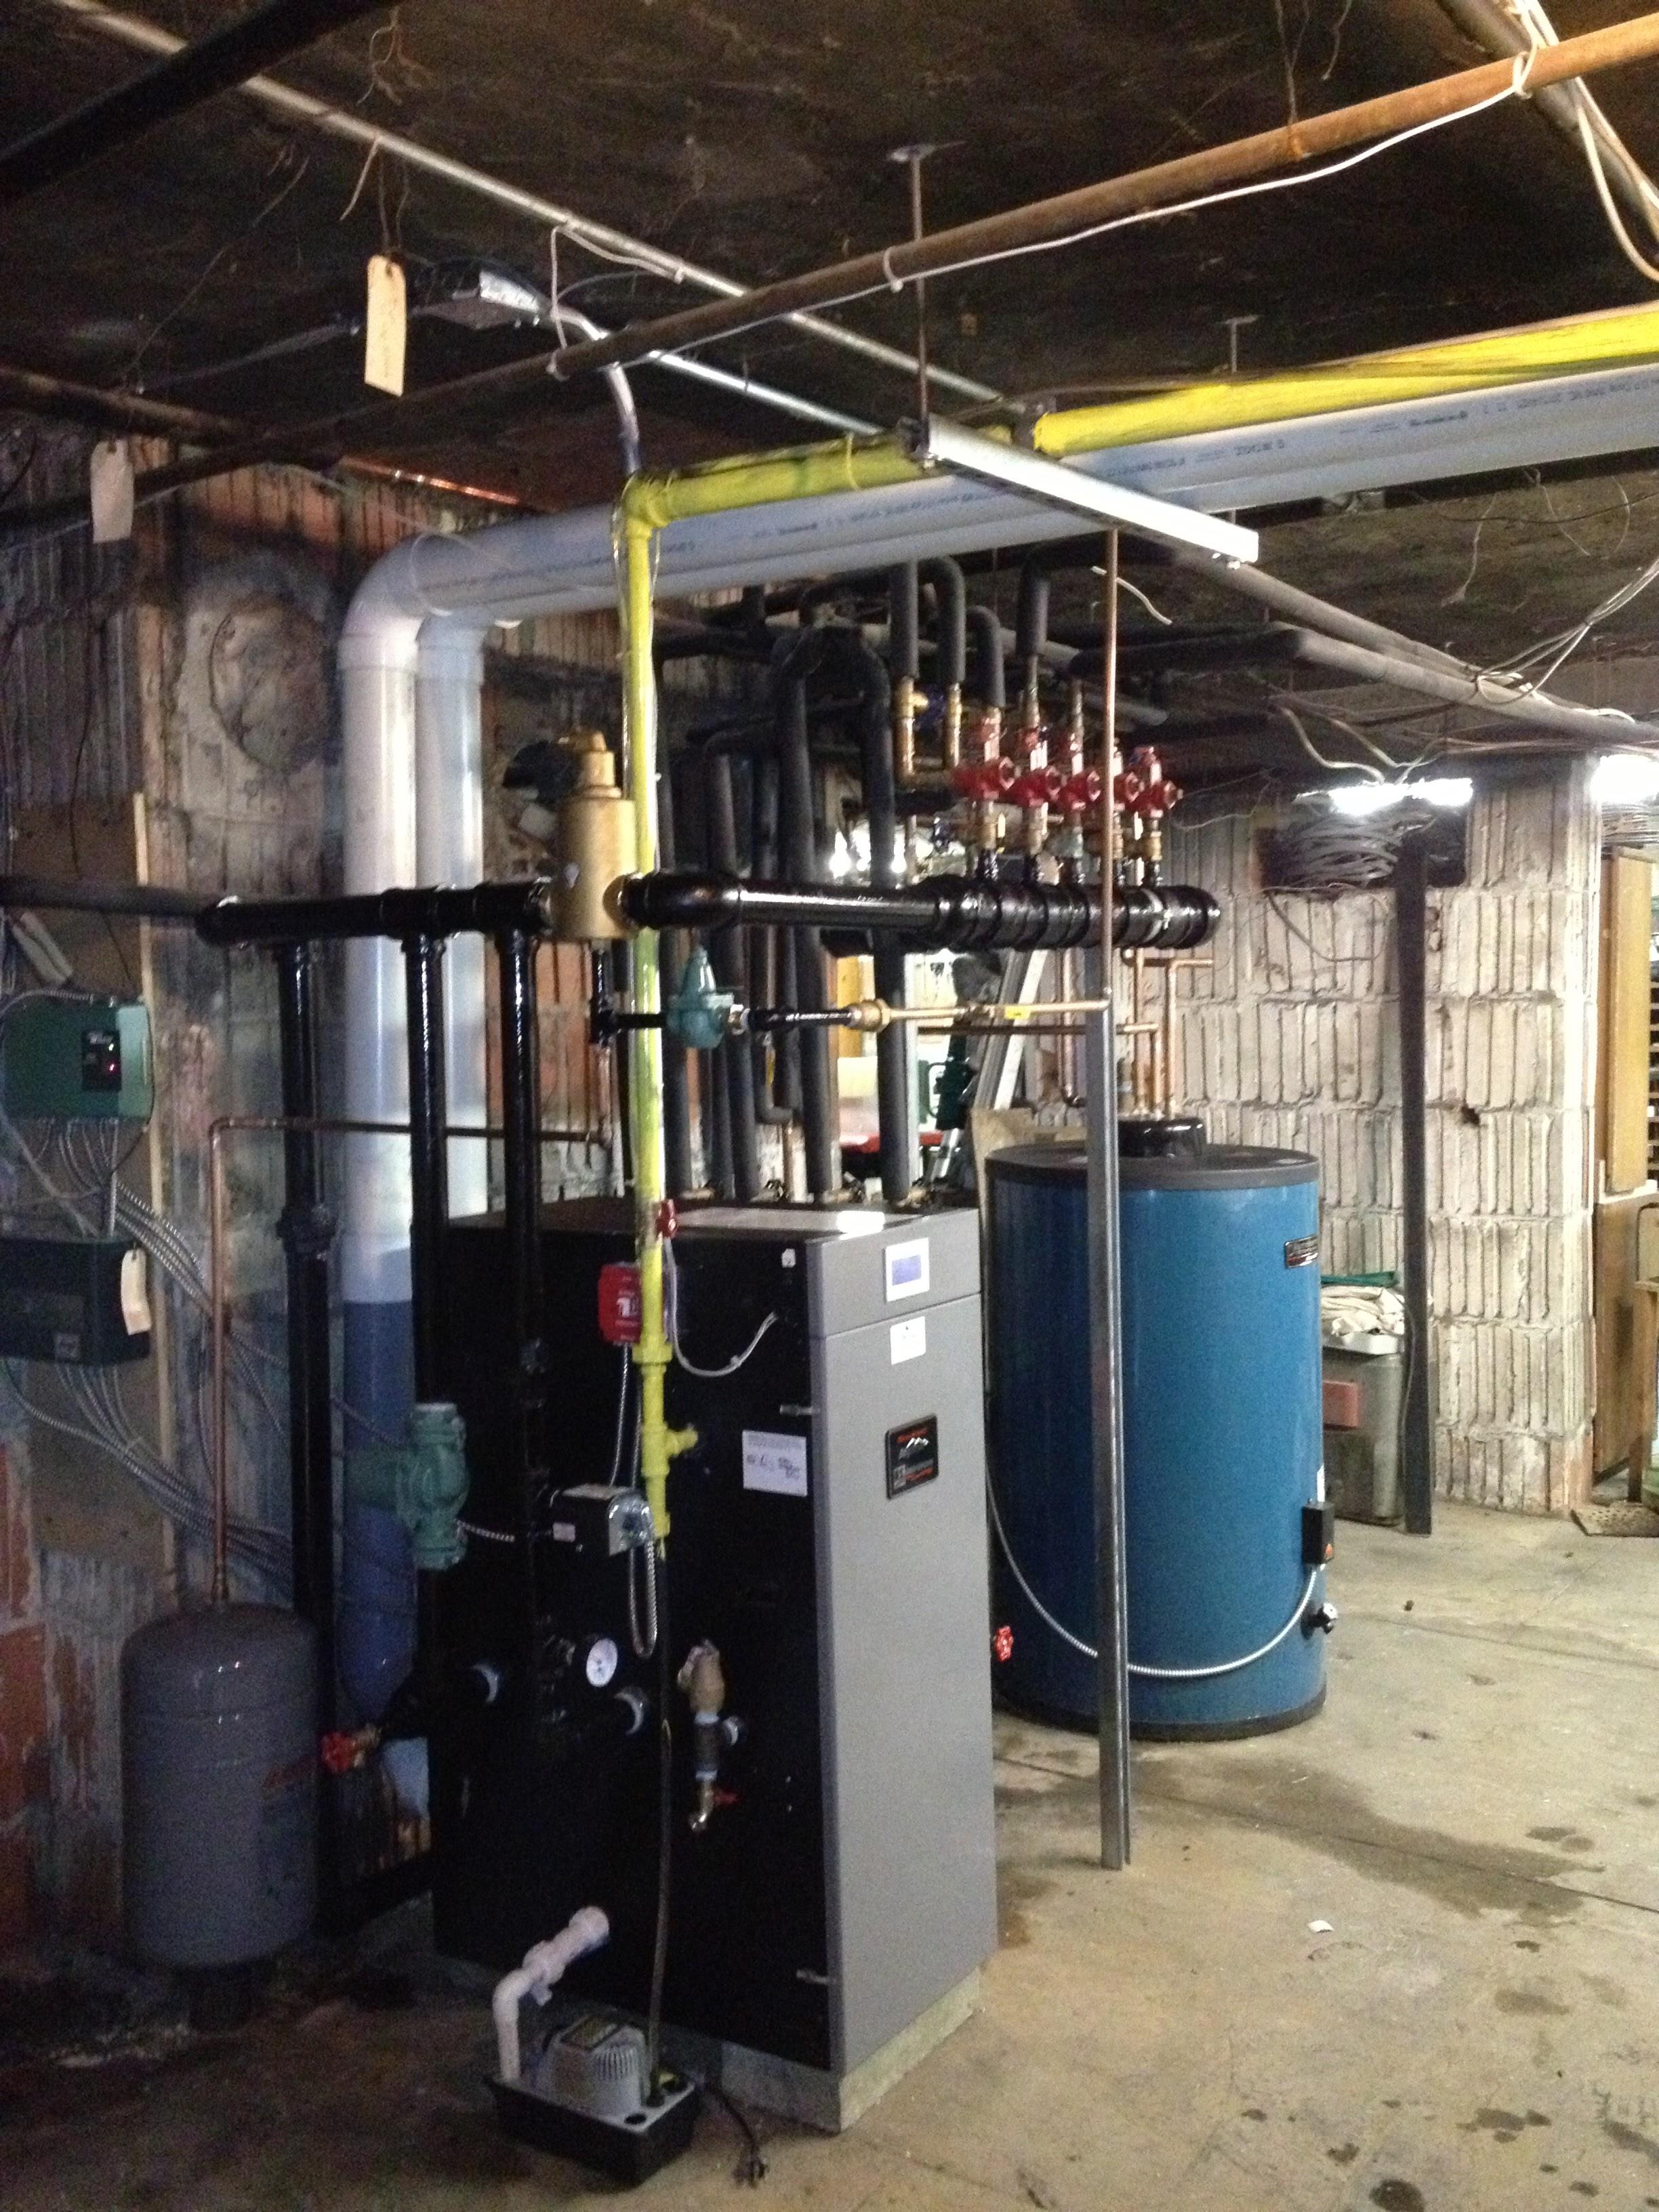 New Burnham Alpine and Burnham Alliance indirect hot water heater